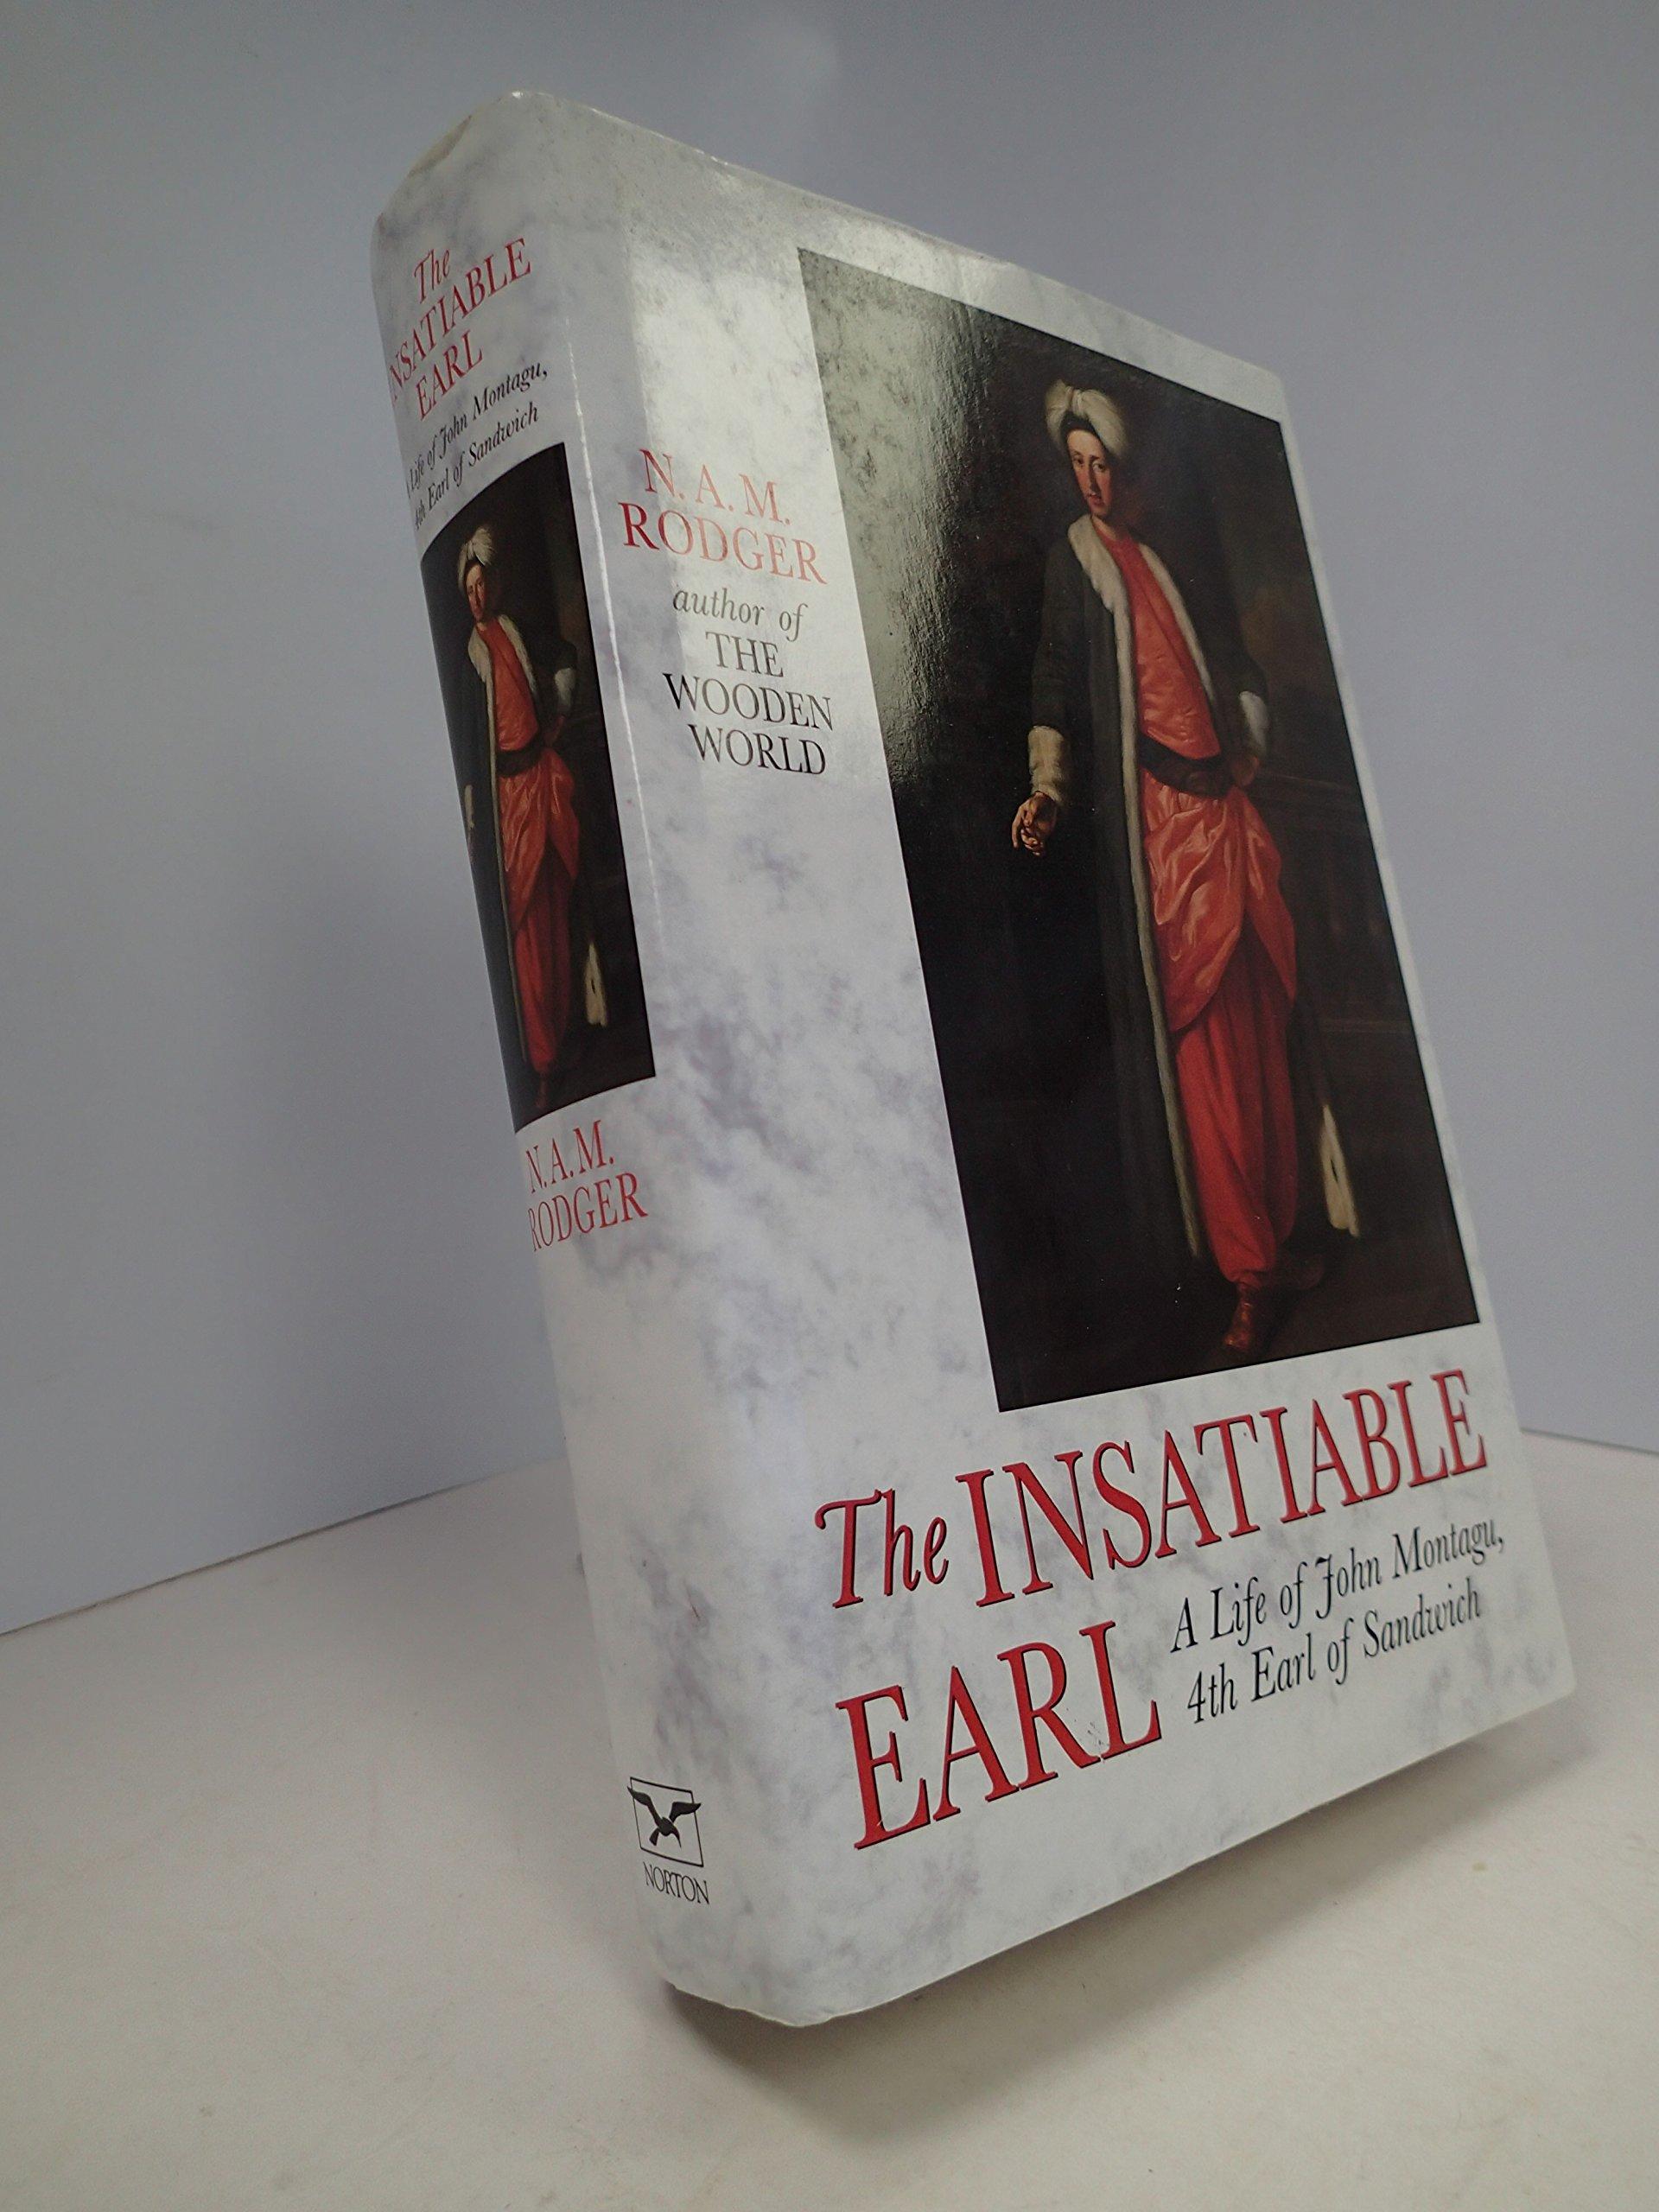 The Insatiable Earl: A Life of John Montagu, Fourth Earl of Sandwich 1718-1792